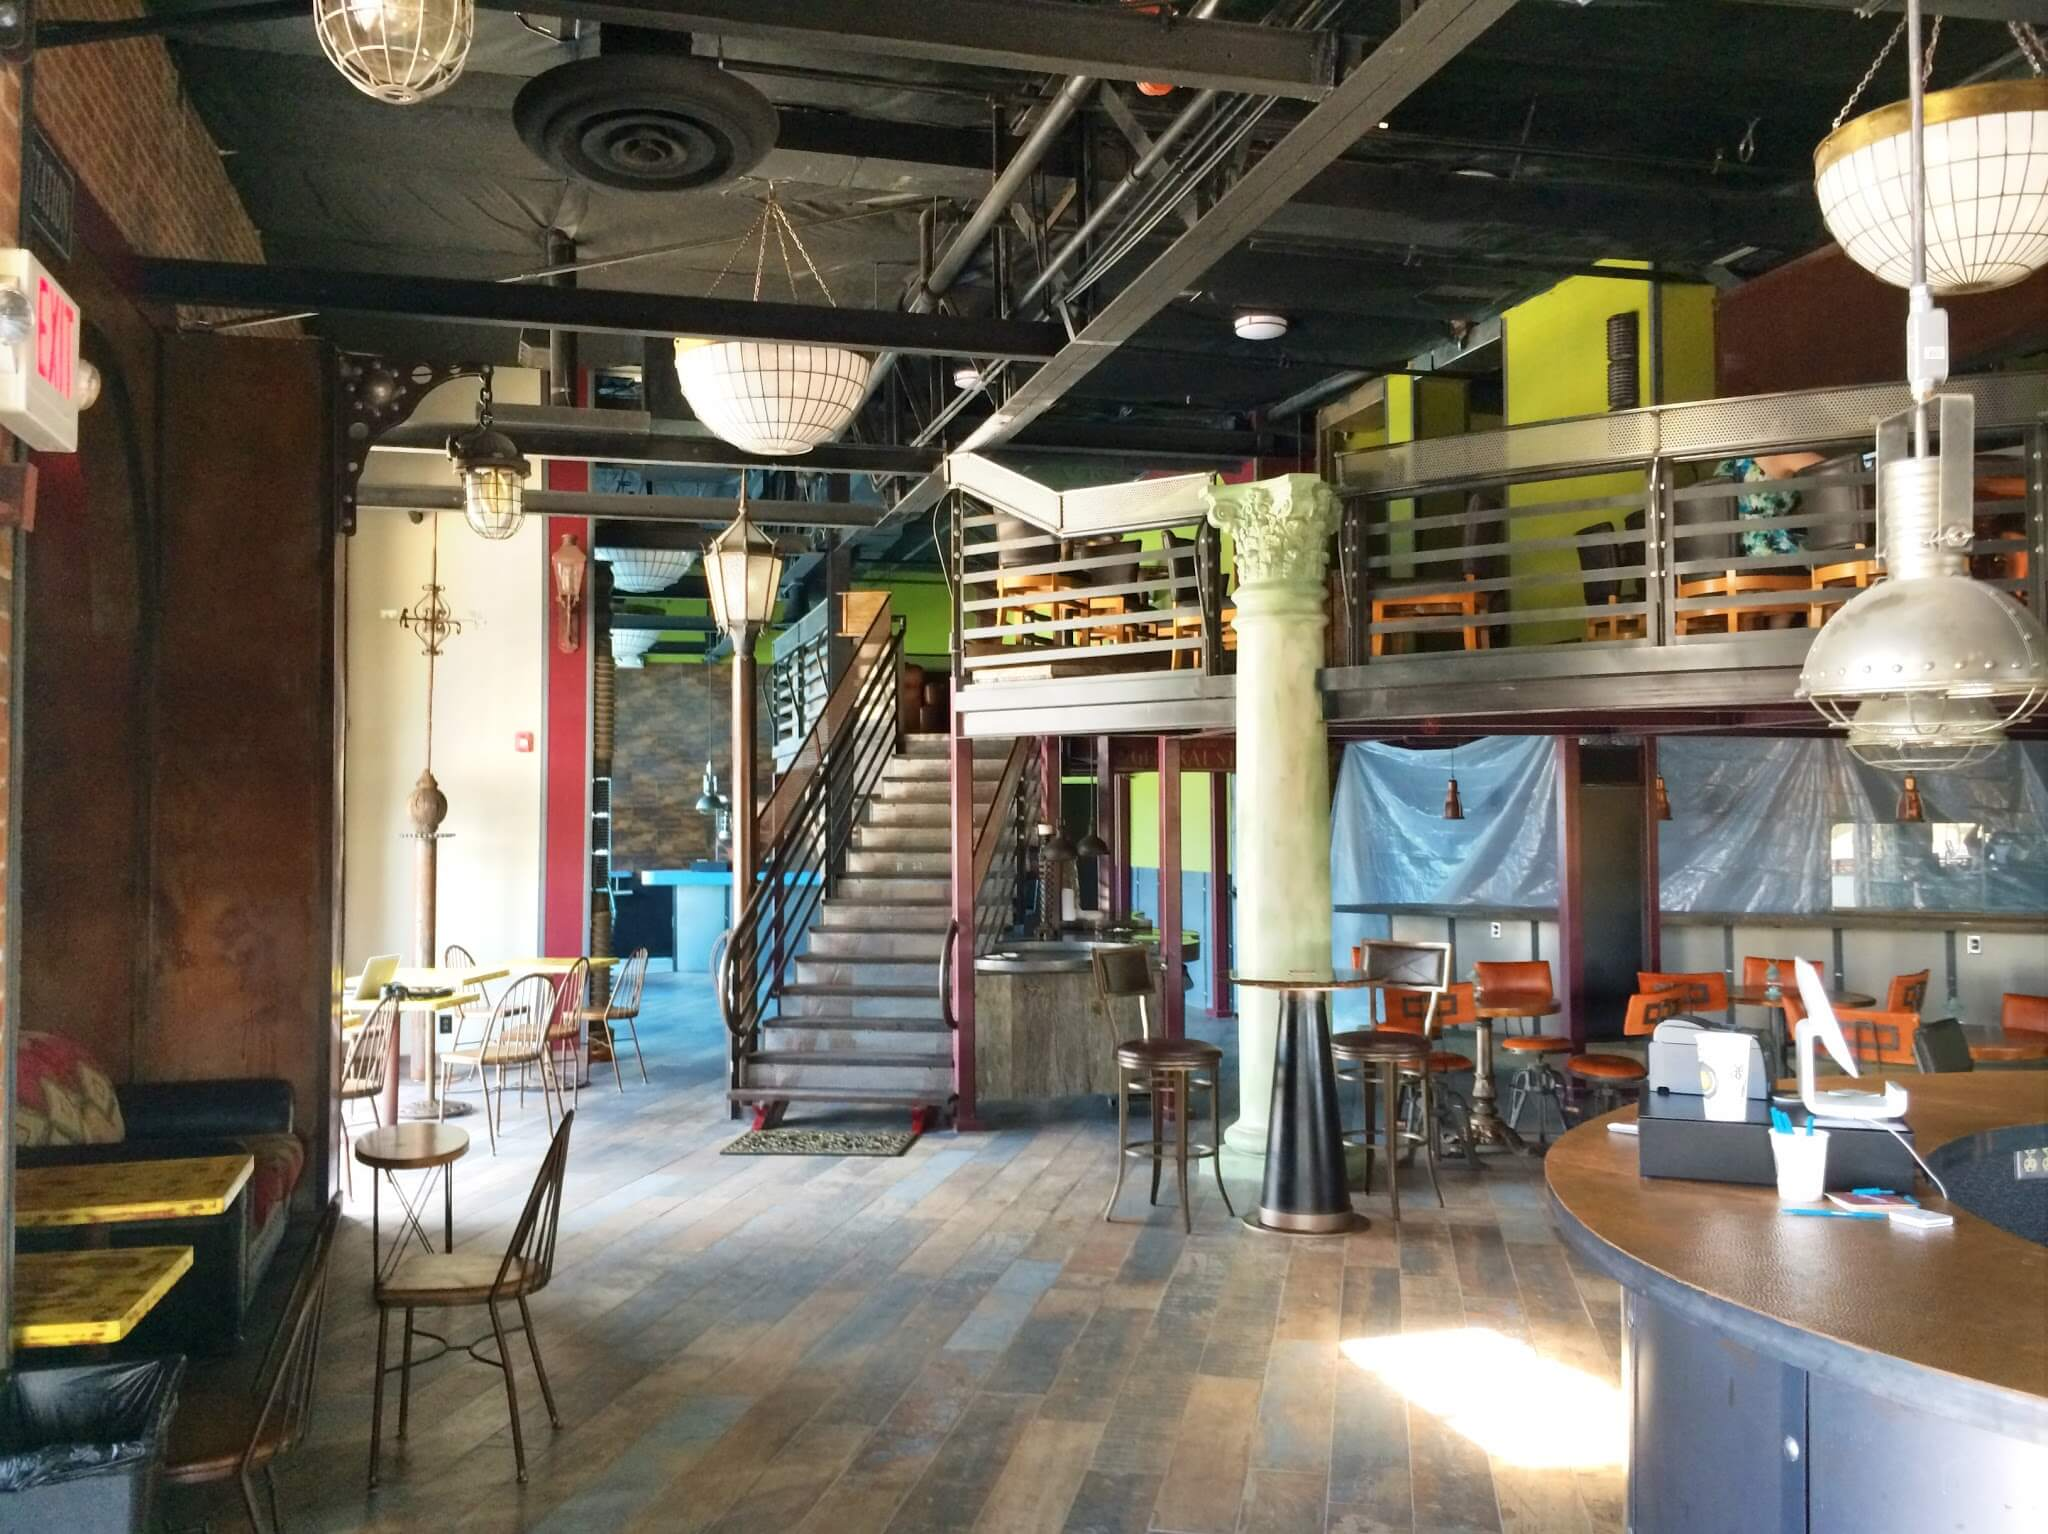 Mezzanine Cafe Shop